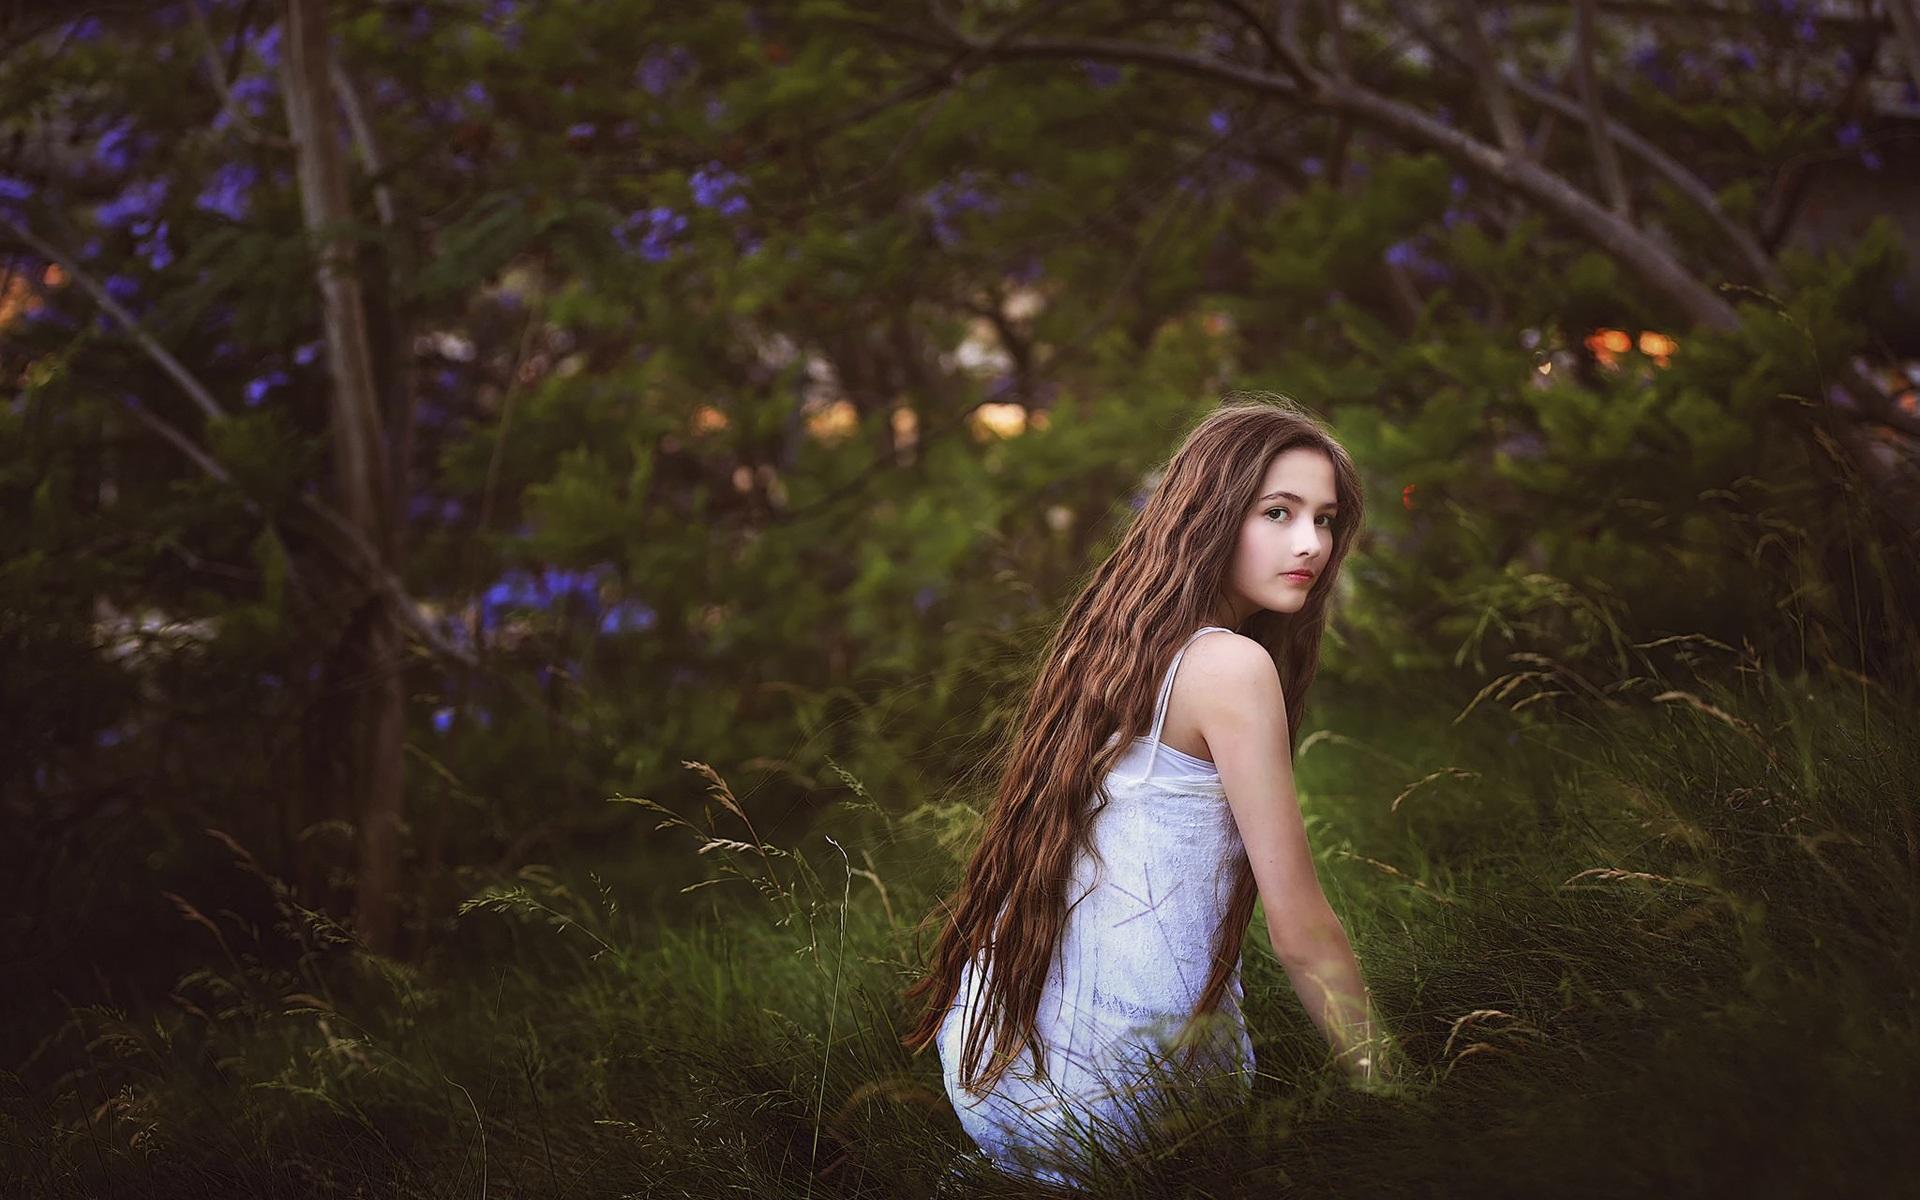 061261153b Wallpaper Girl in the grass